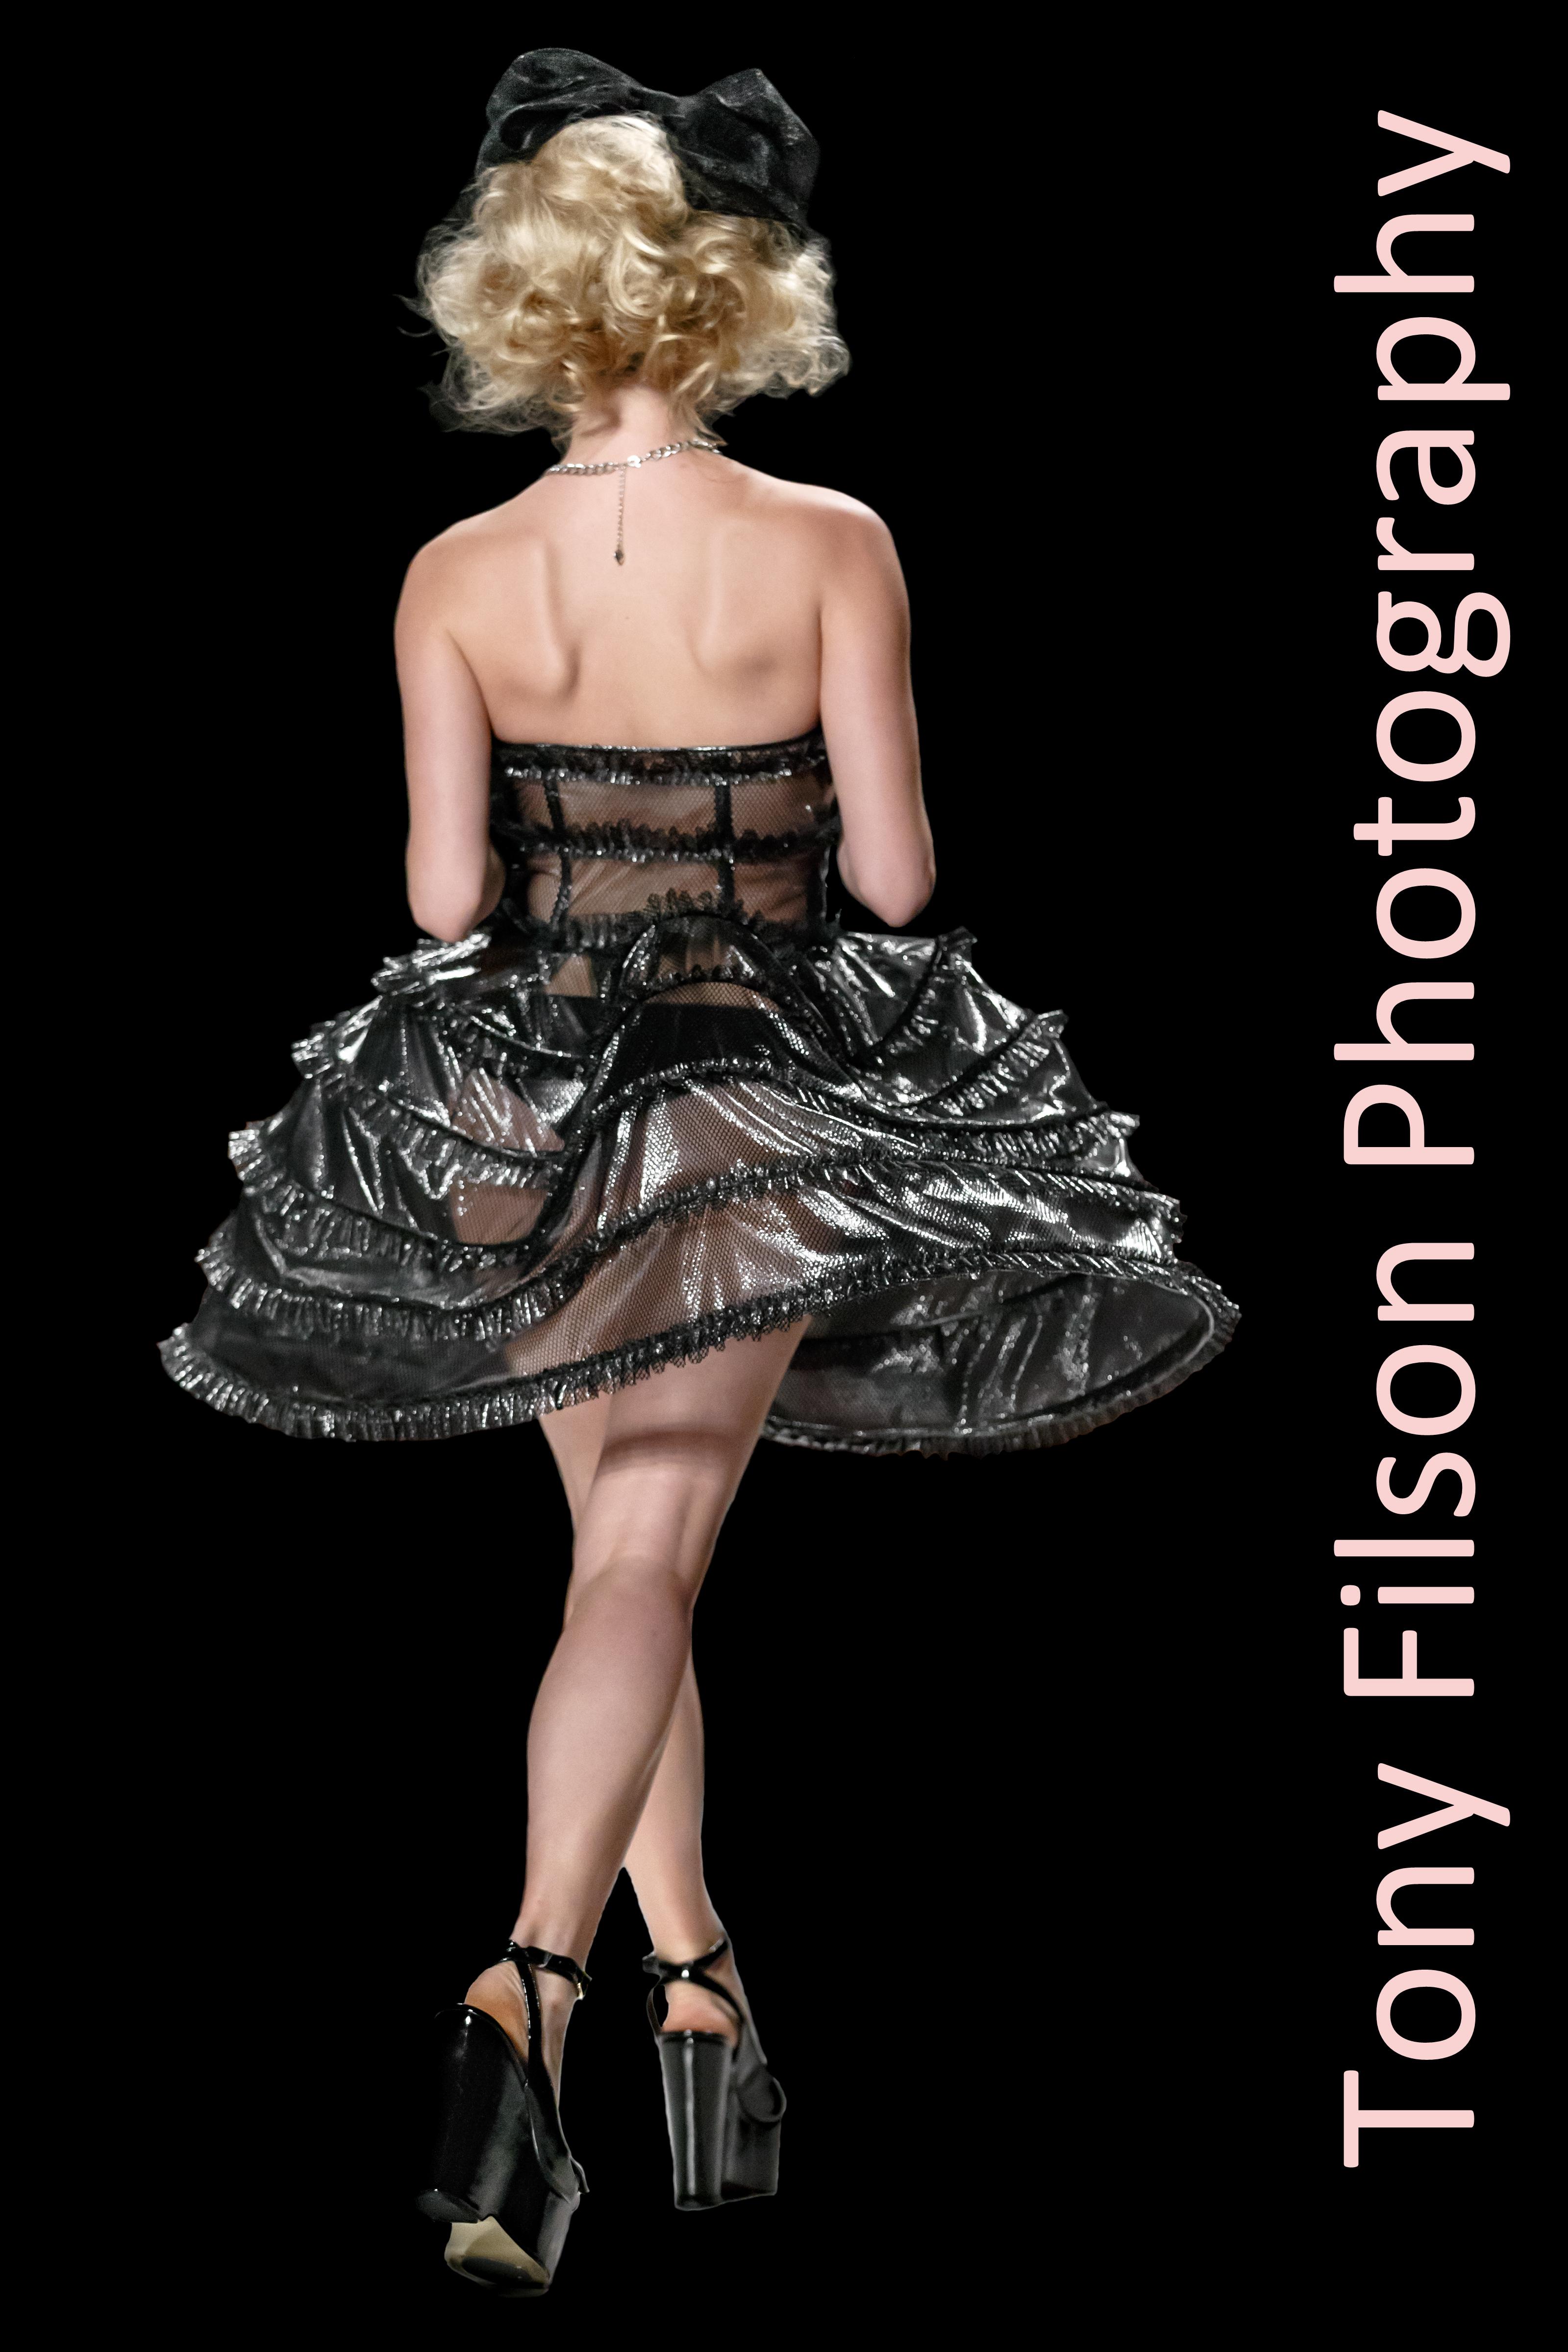 NYFW Photographer | Tony Filson NYFW